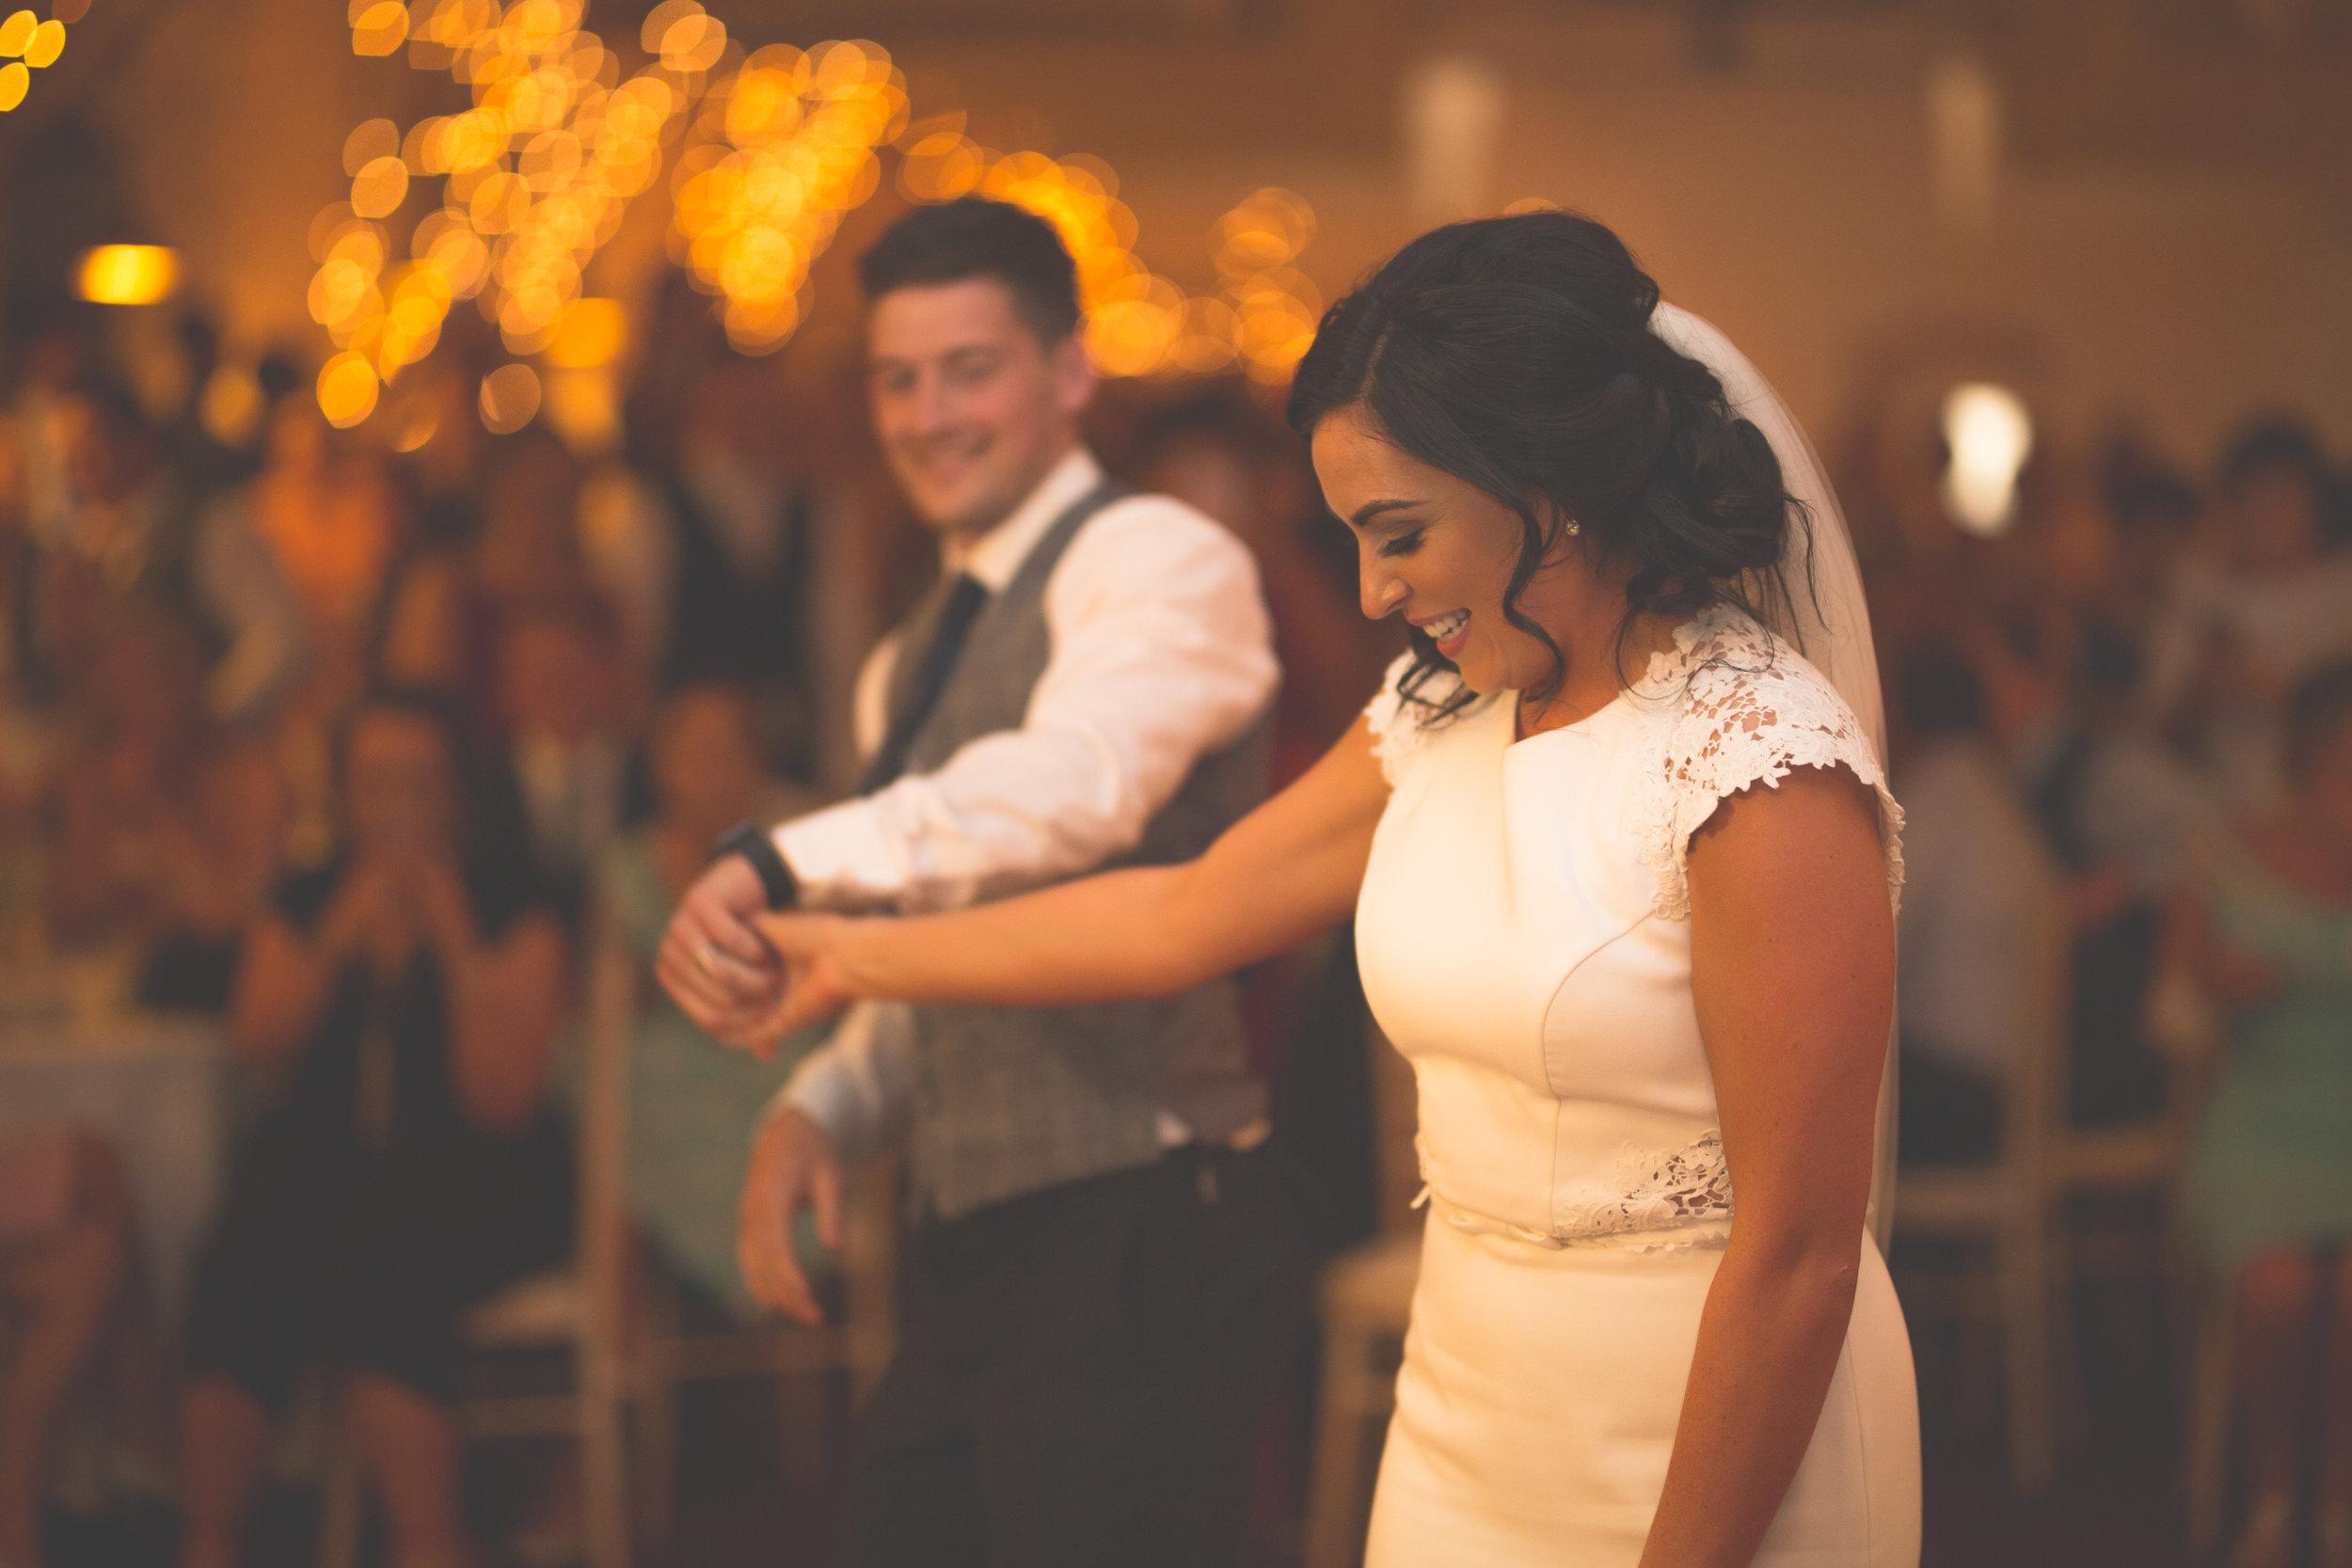 Brian McEwan Wedding Photography | Carol-Annee & Sean | The Dancing-20.jpg